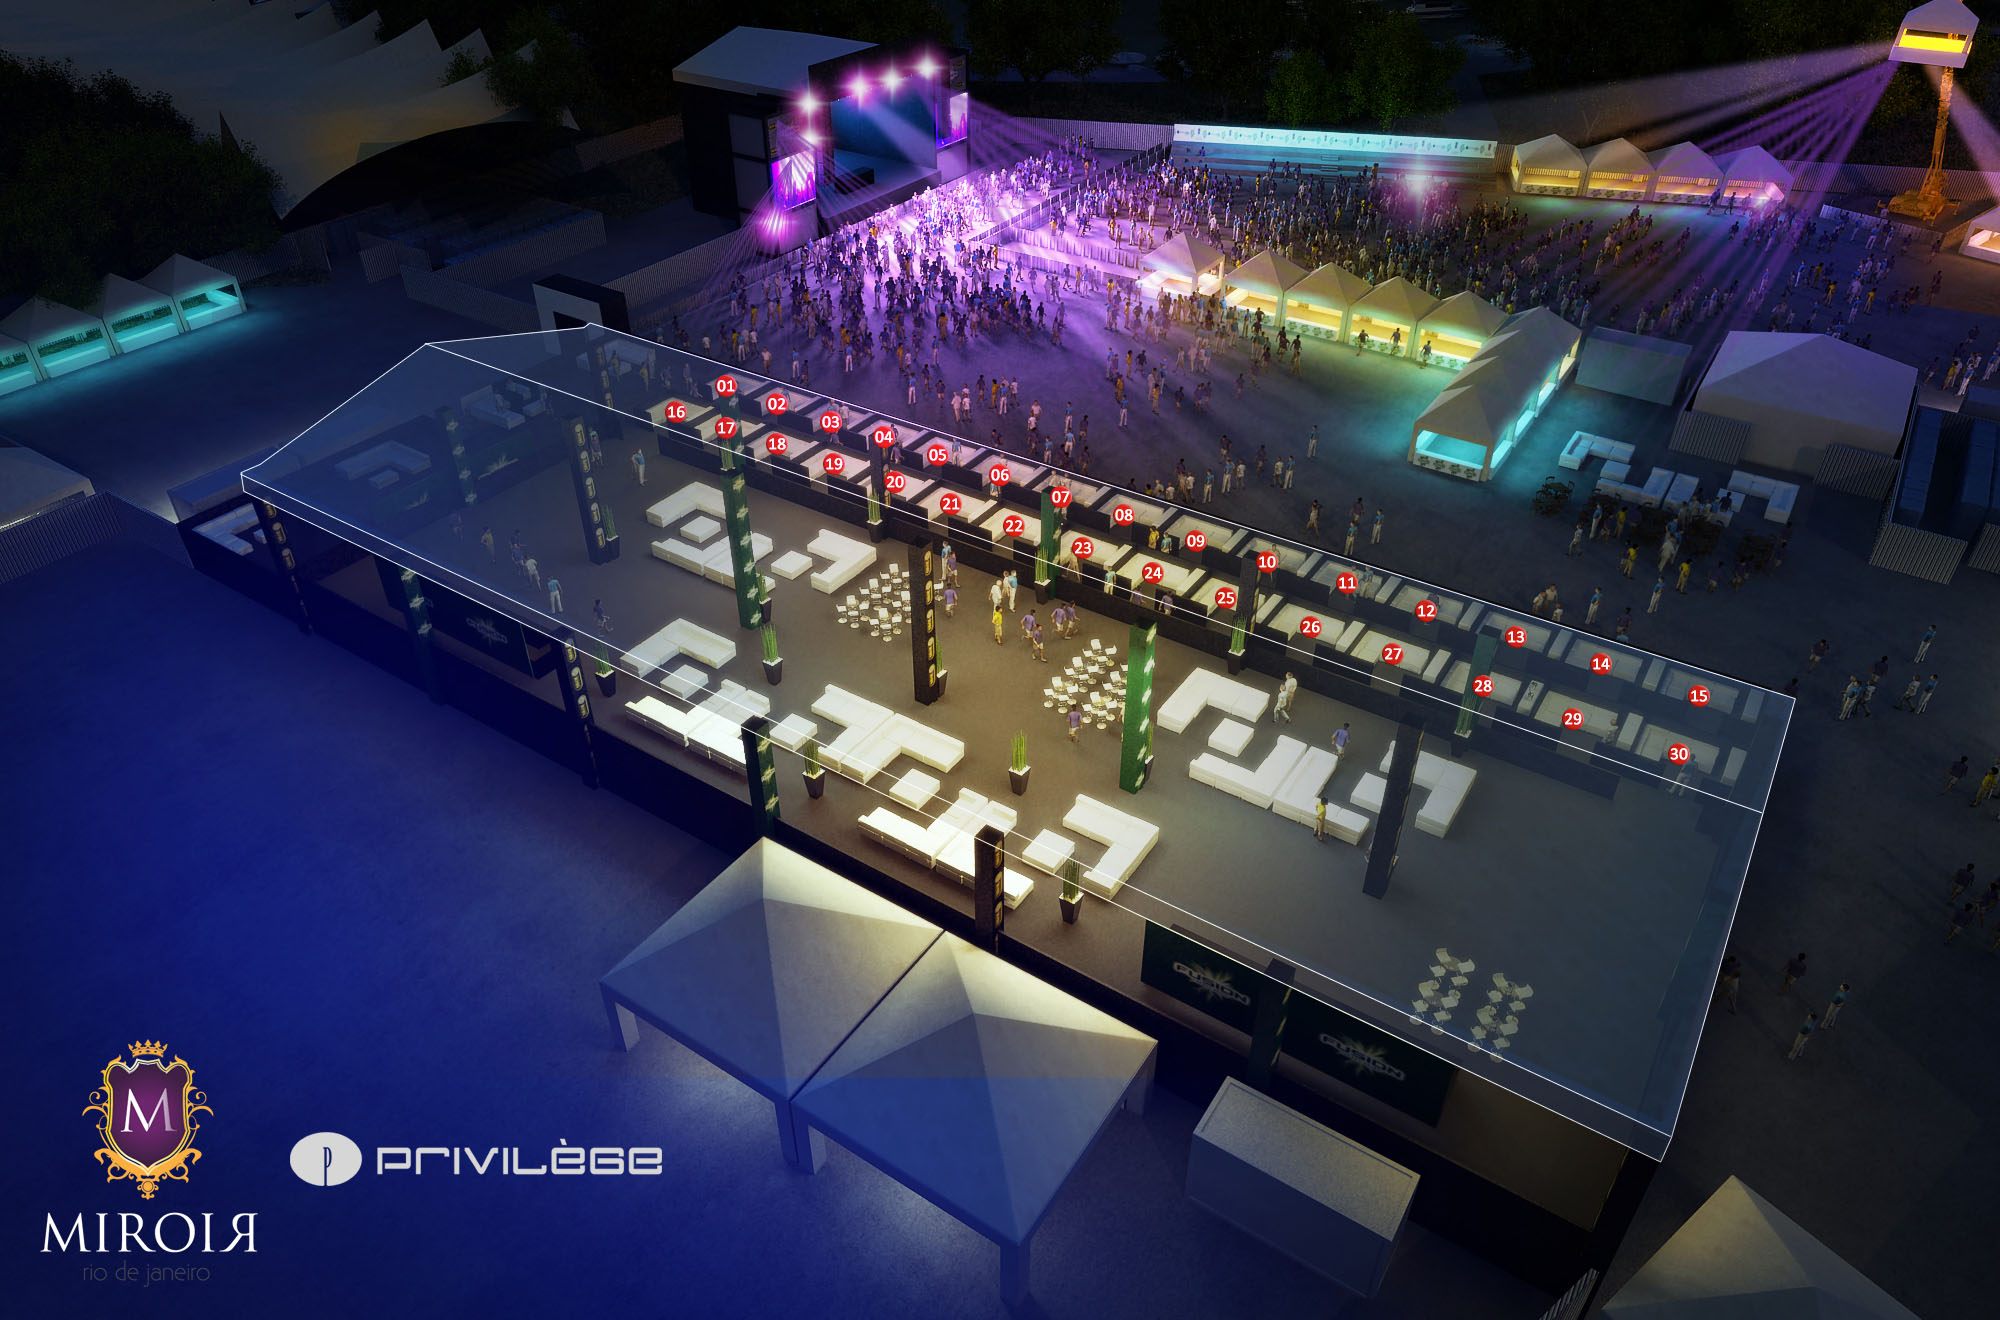 Novidades privil ge assina o camarote neon future for Miroir nightclub rio